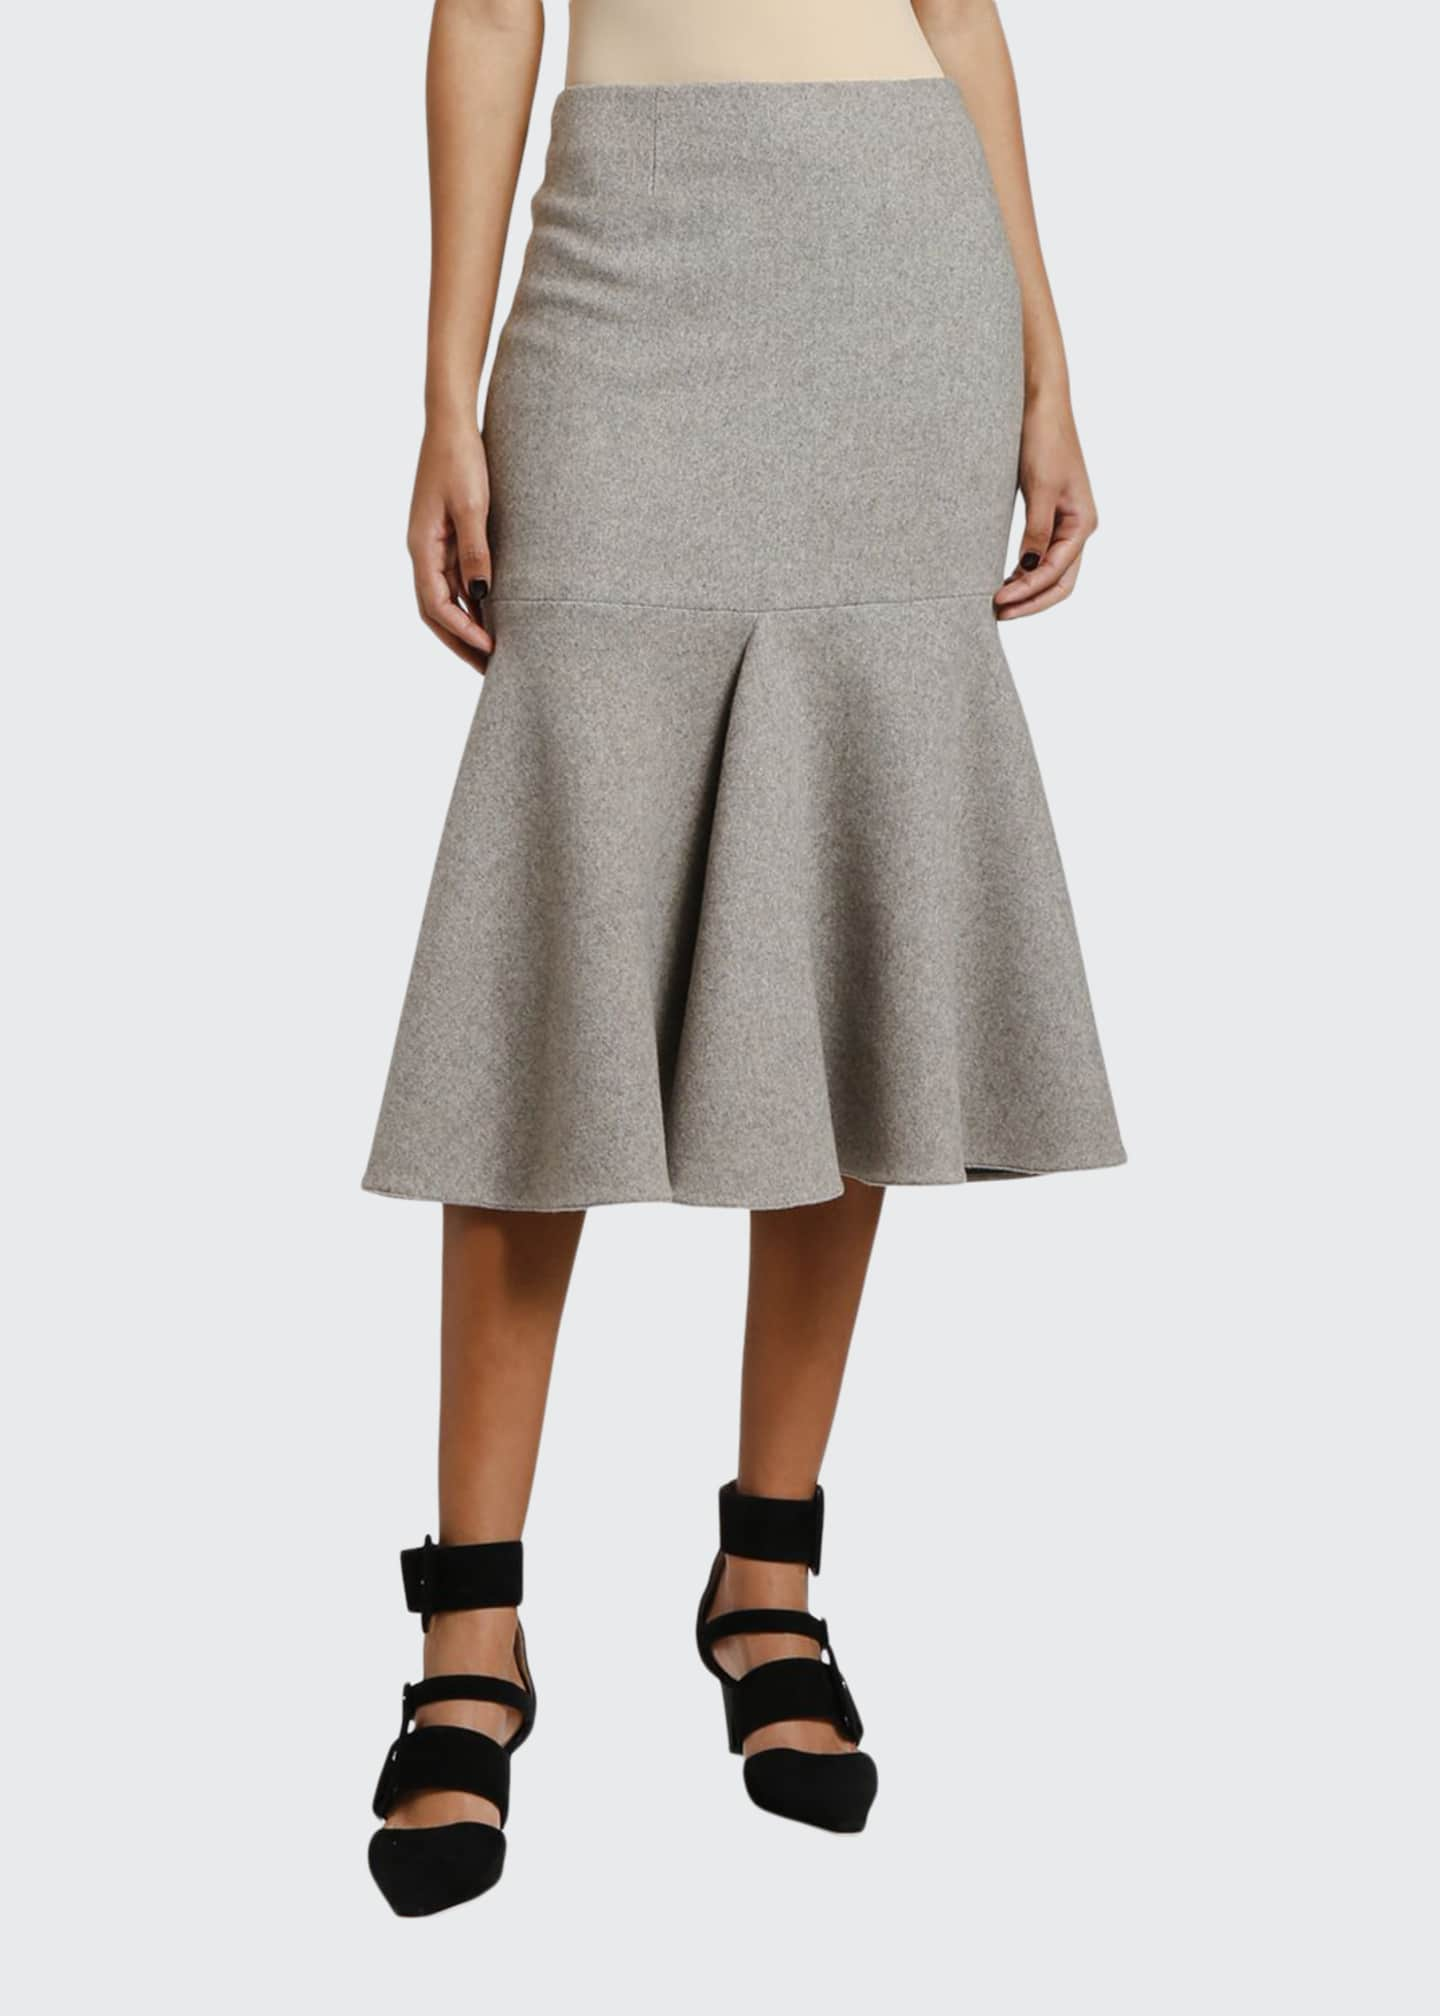 Giorgio Armani Cashmere Jersey Flounce Skirt